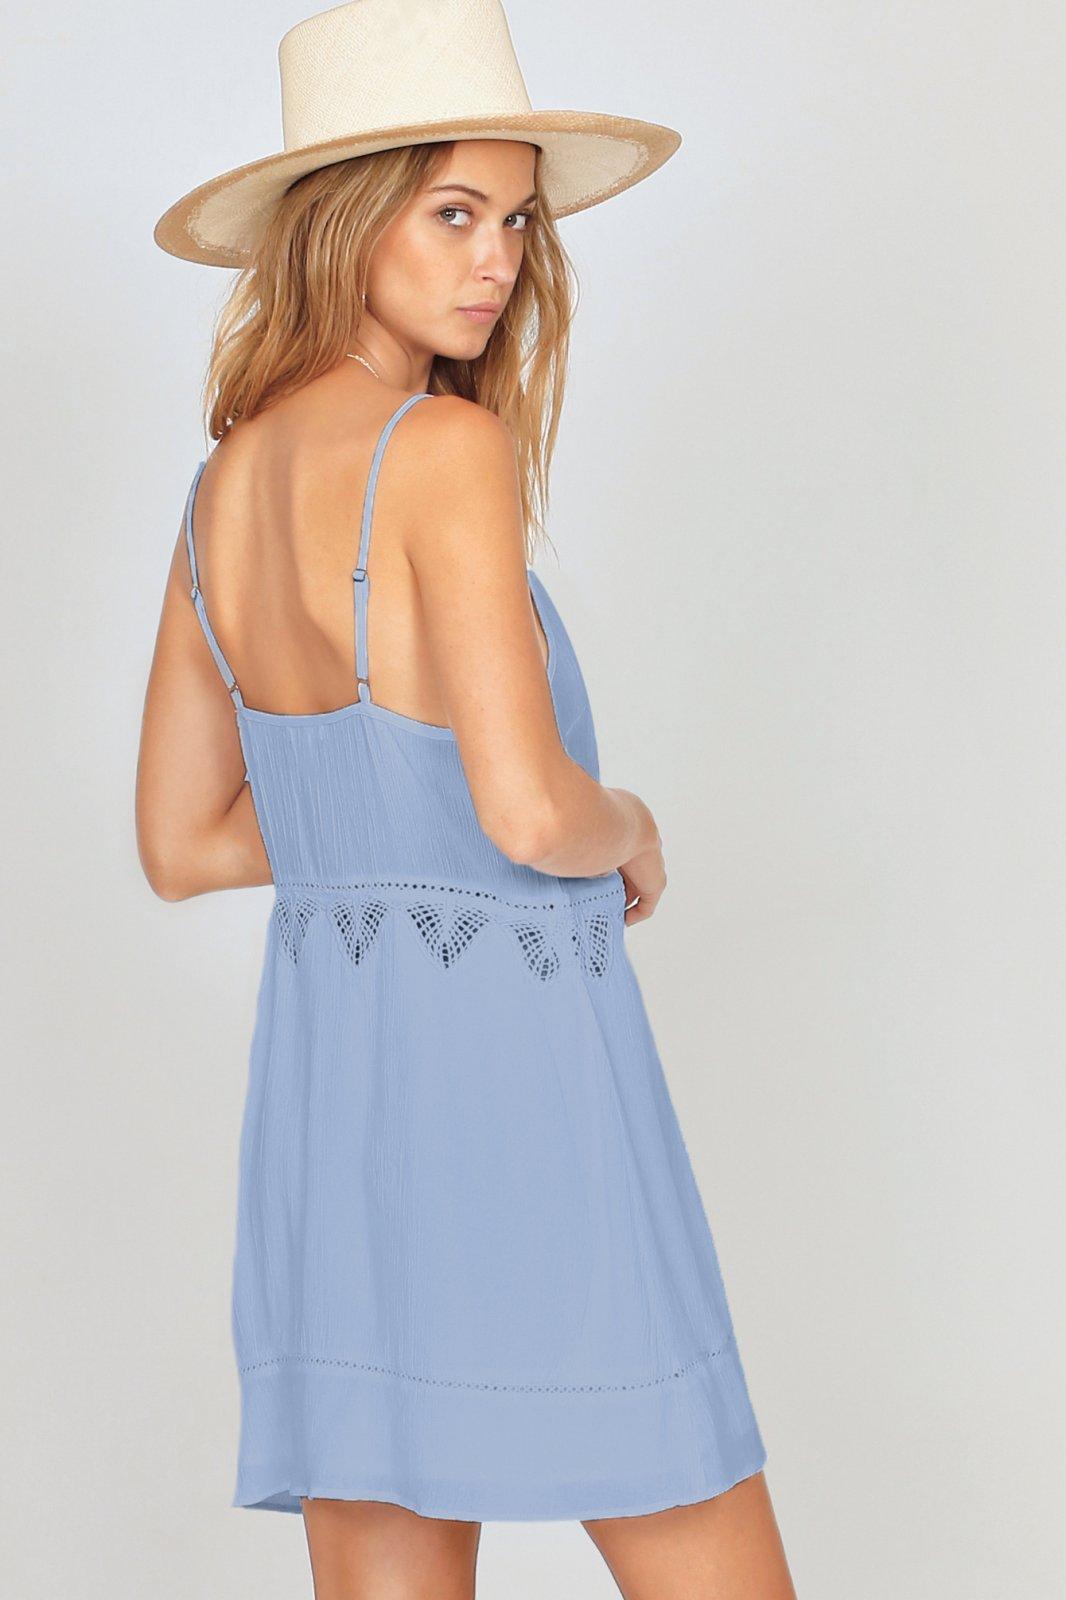 Amuse Society Beach Luxe Dress Light Blue